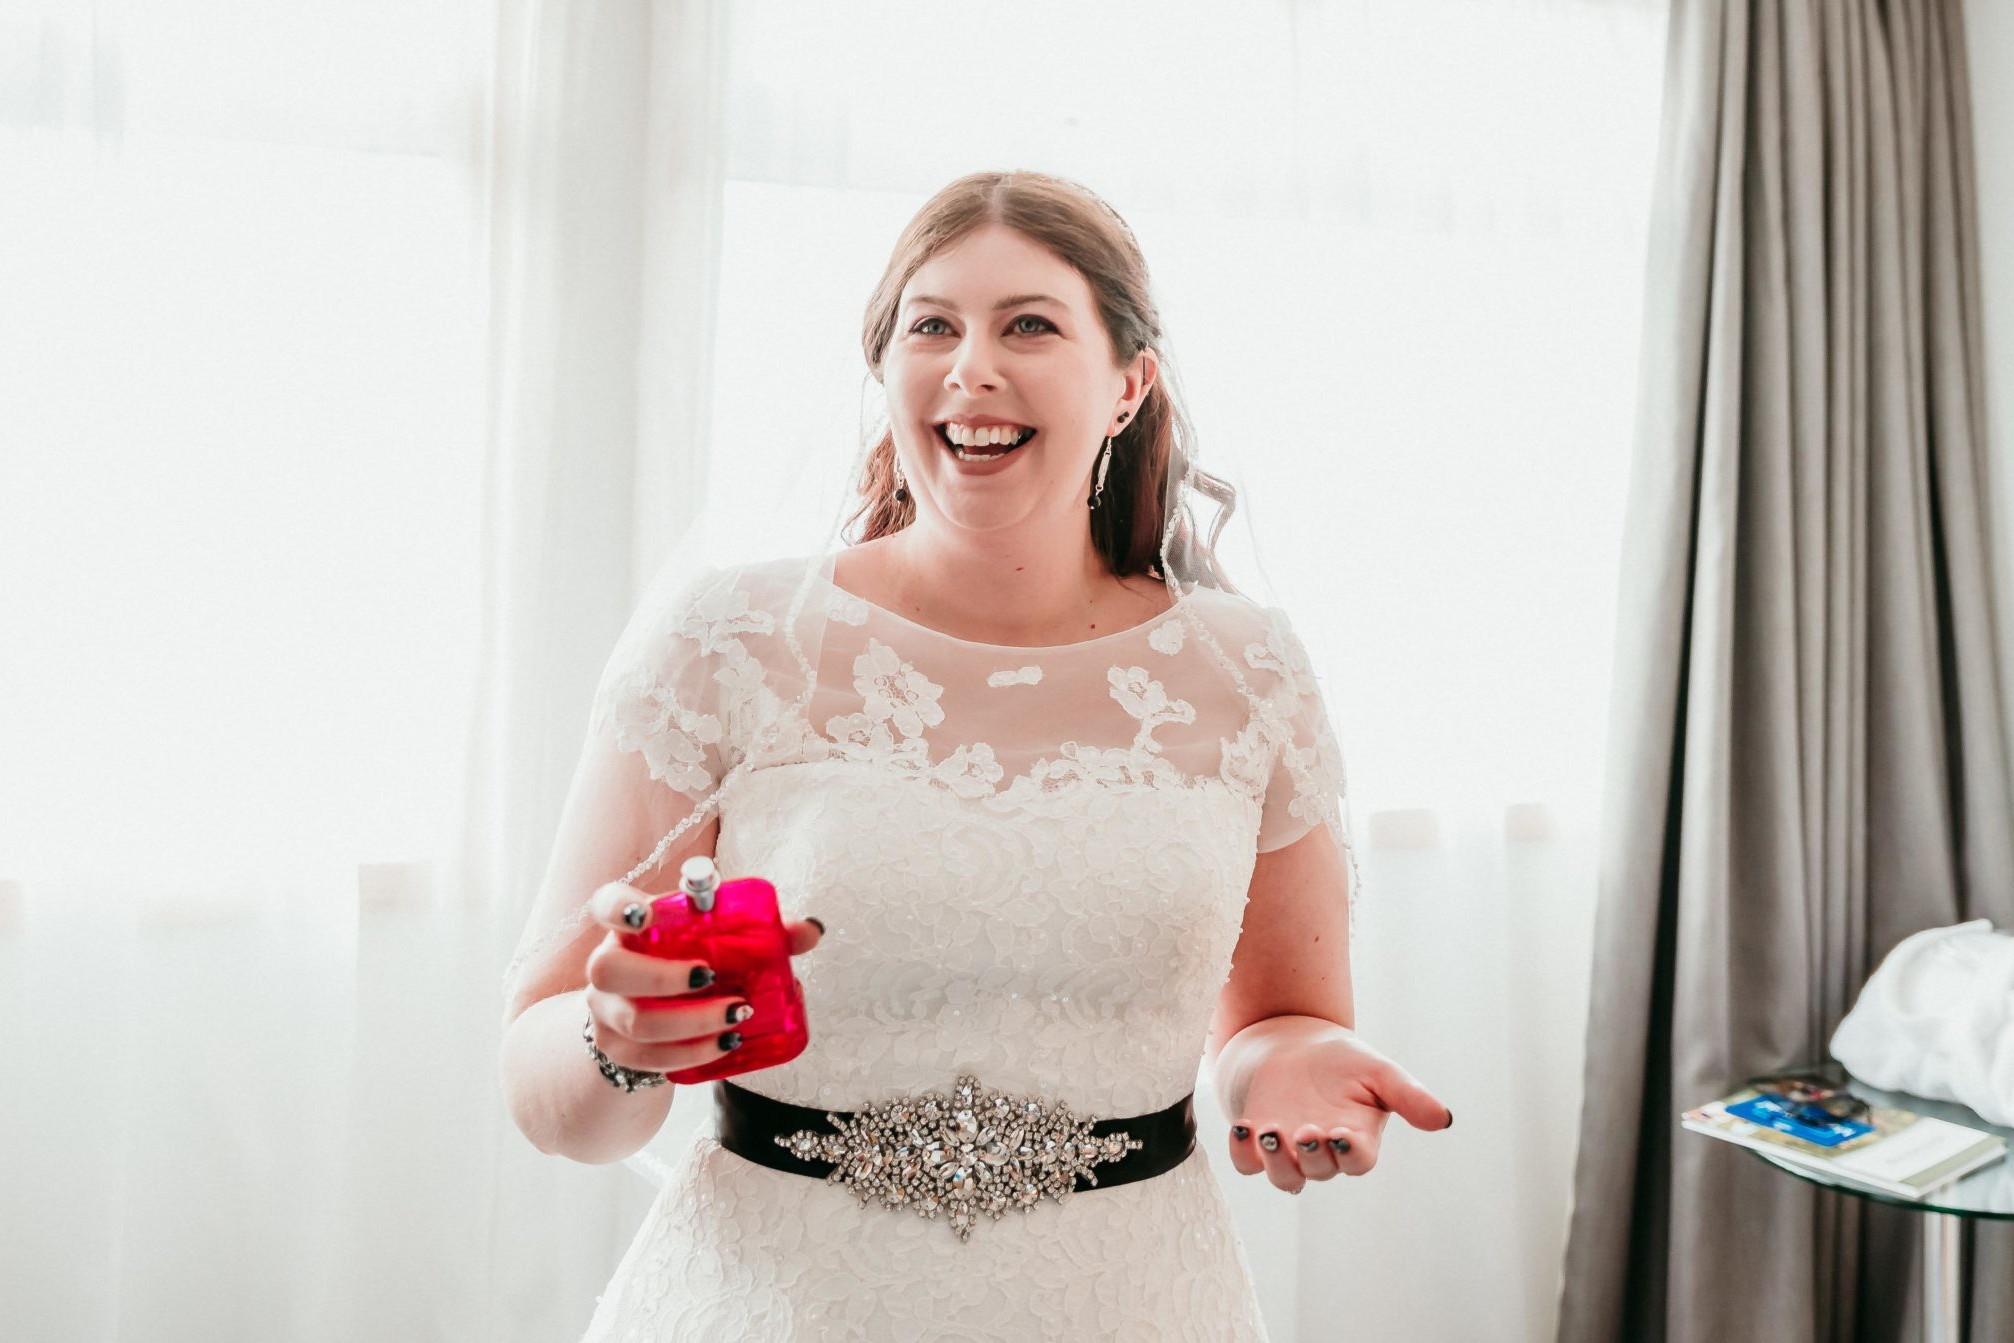 Sarah at the Hilton Hotel Watford , getting ready for her weddinga